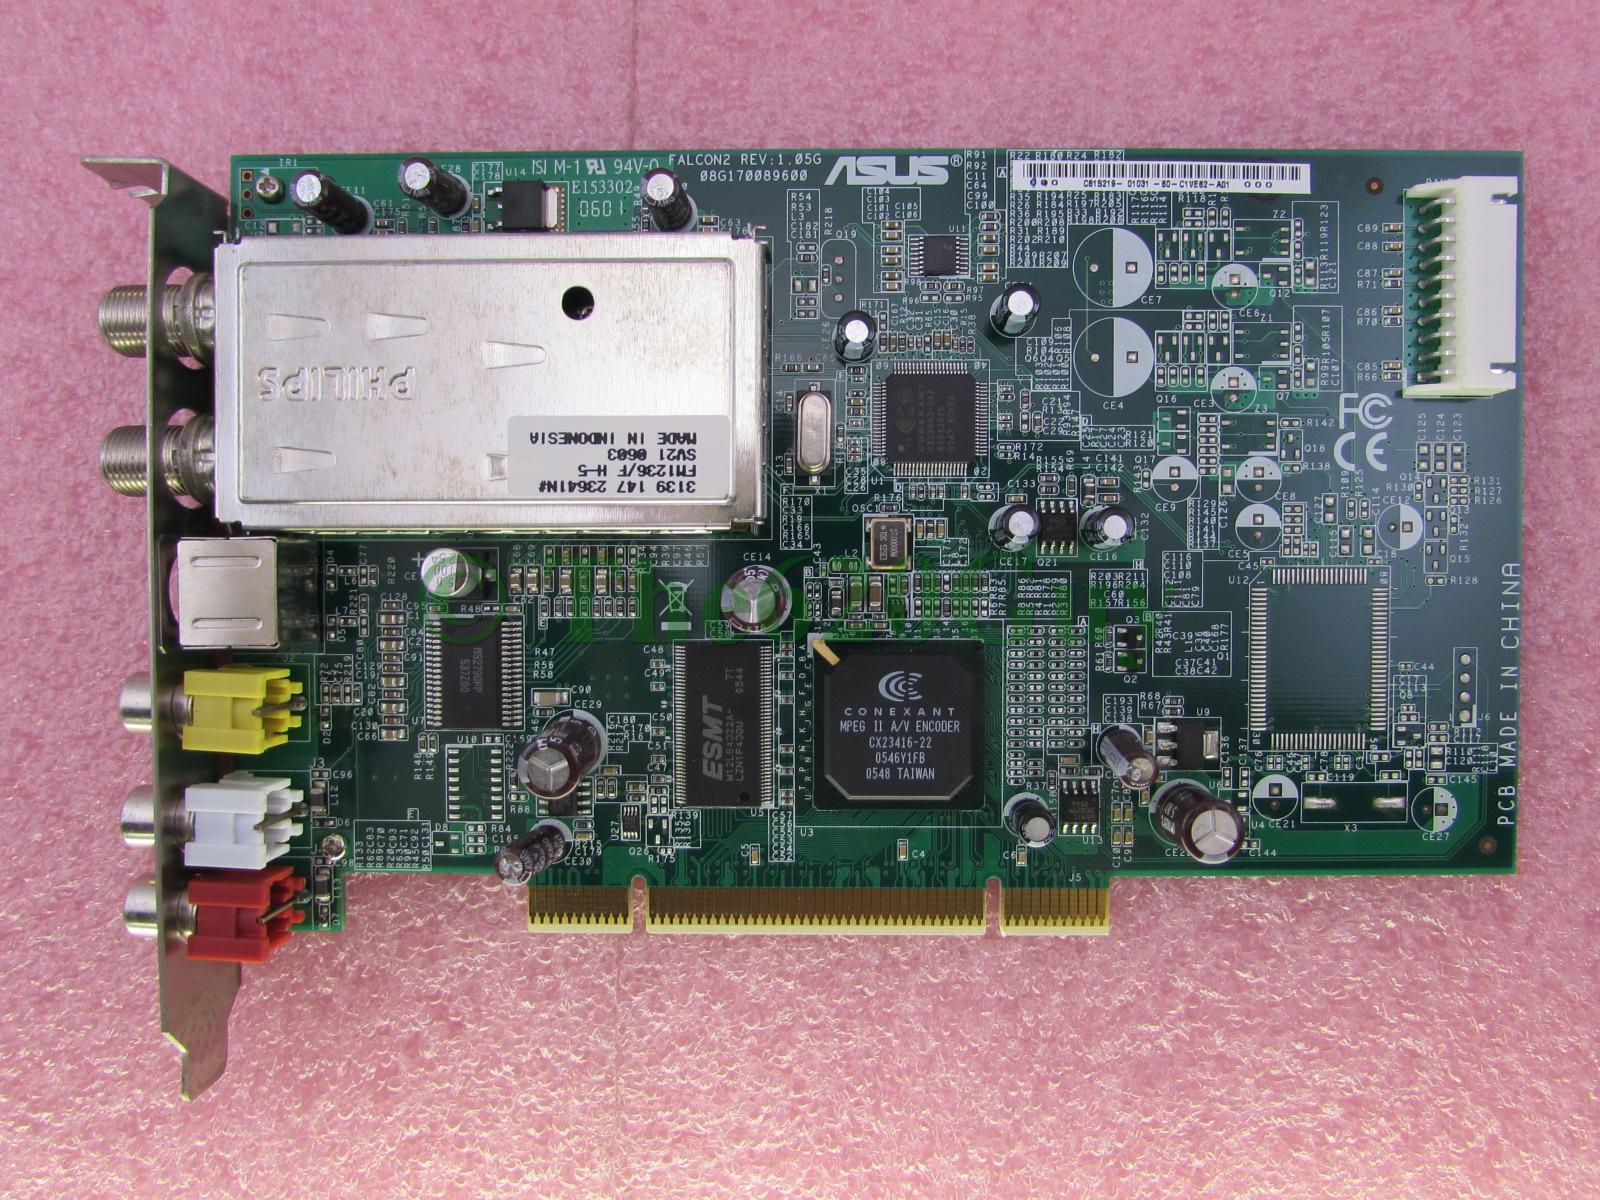 Conexant Falcon II NTSC Video Capture - driver scan FOUND